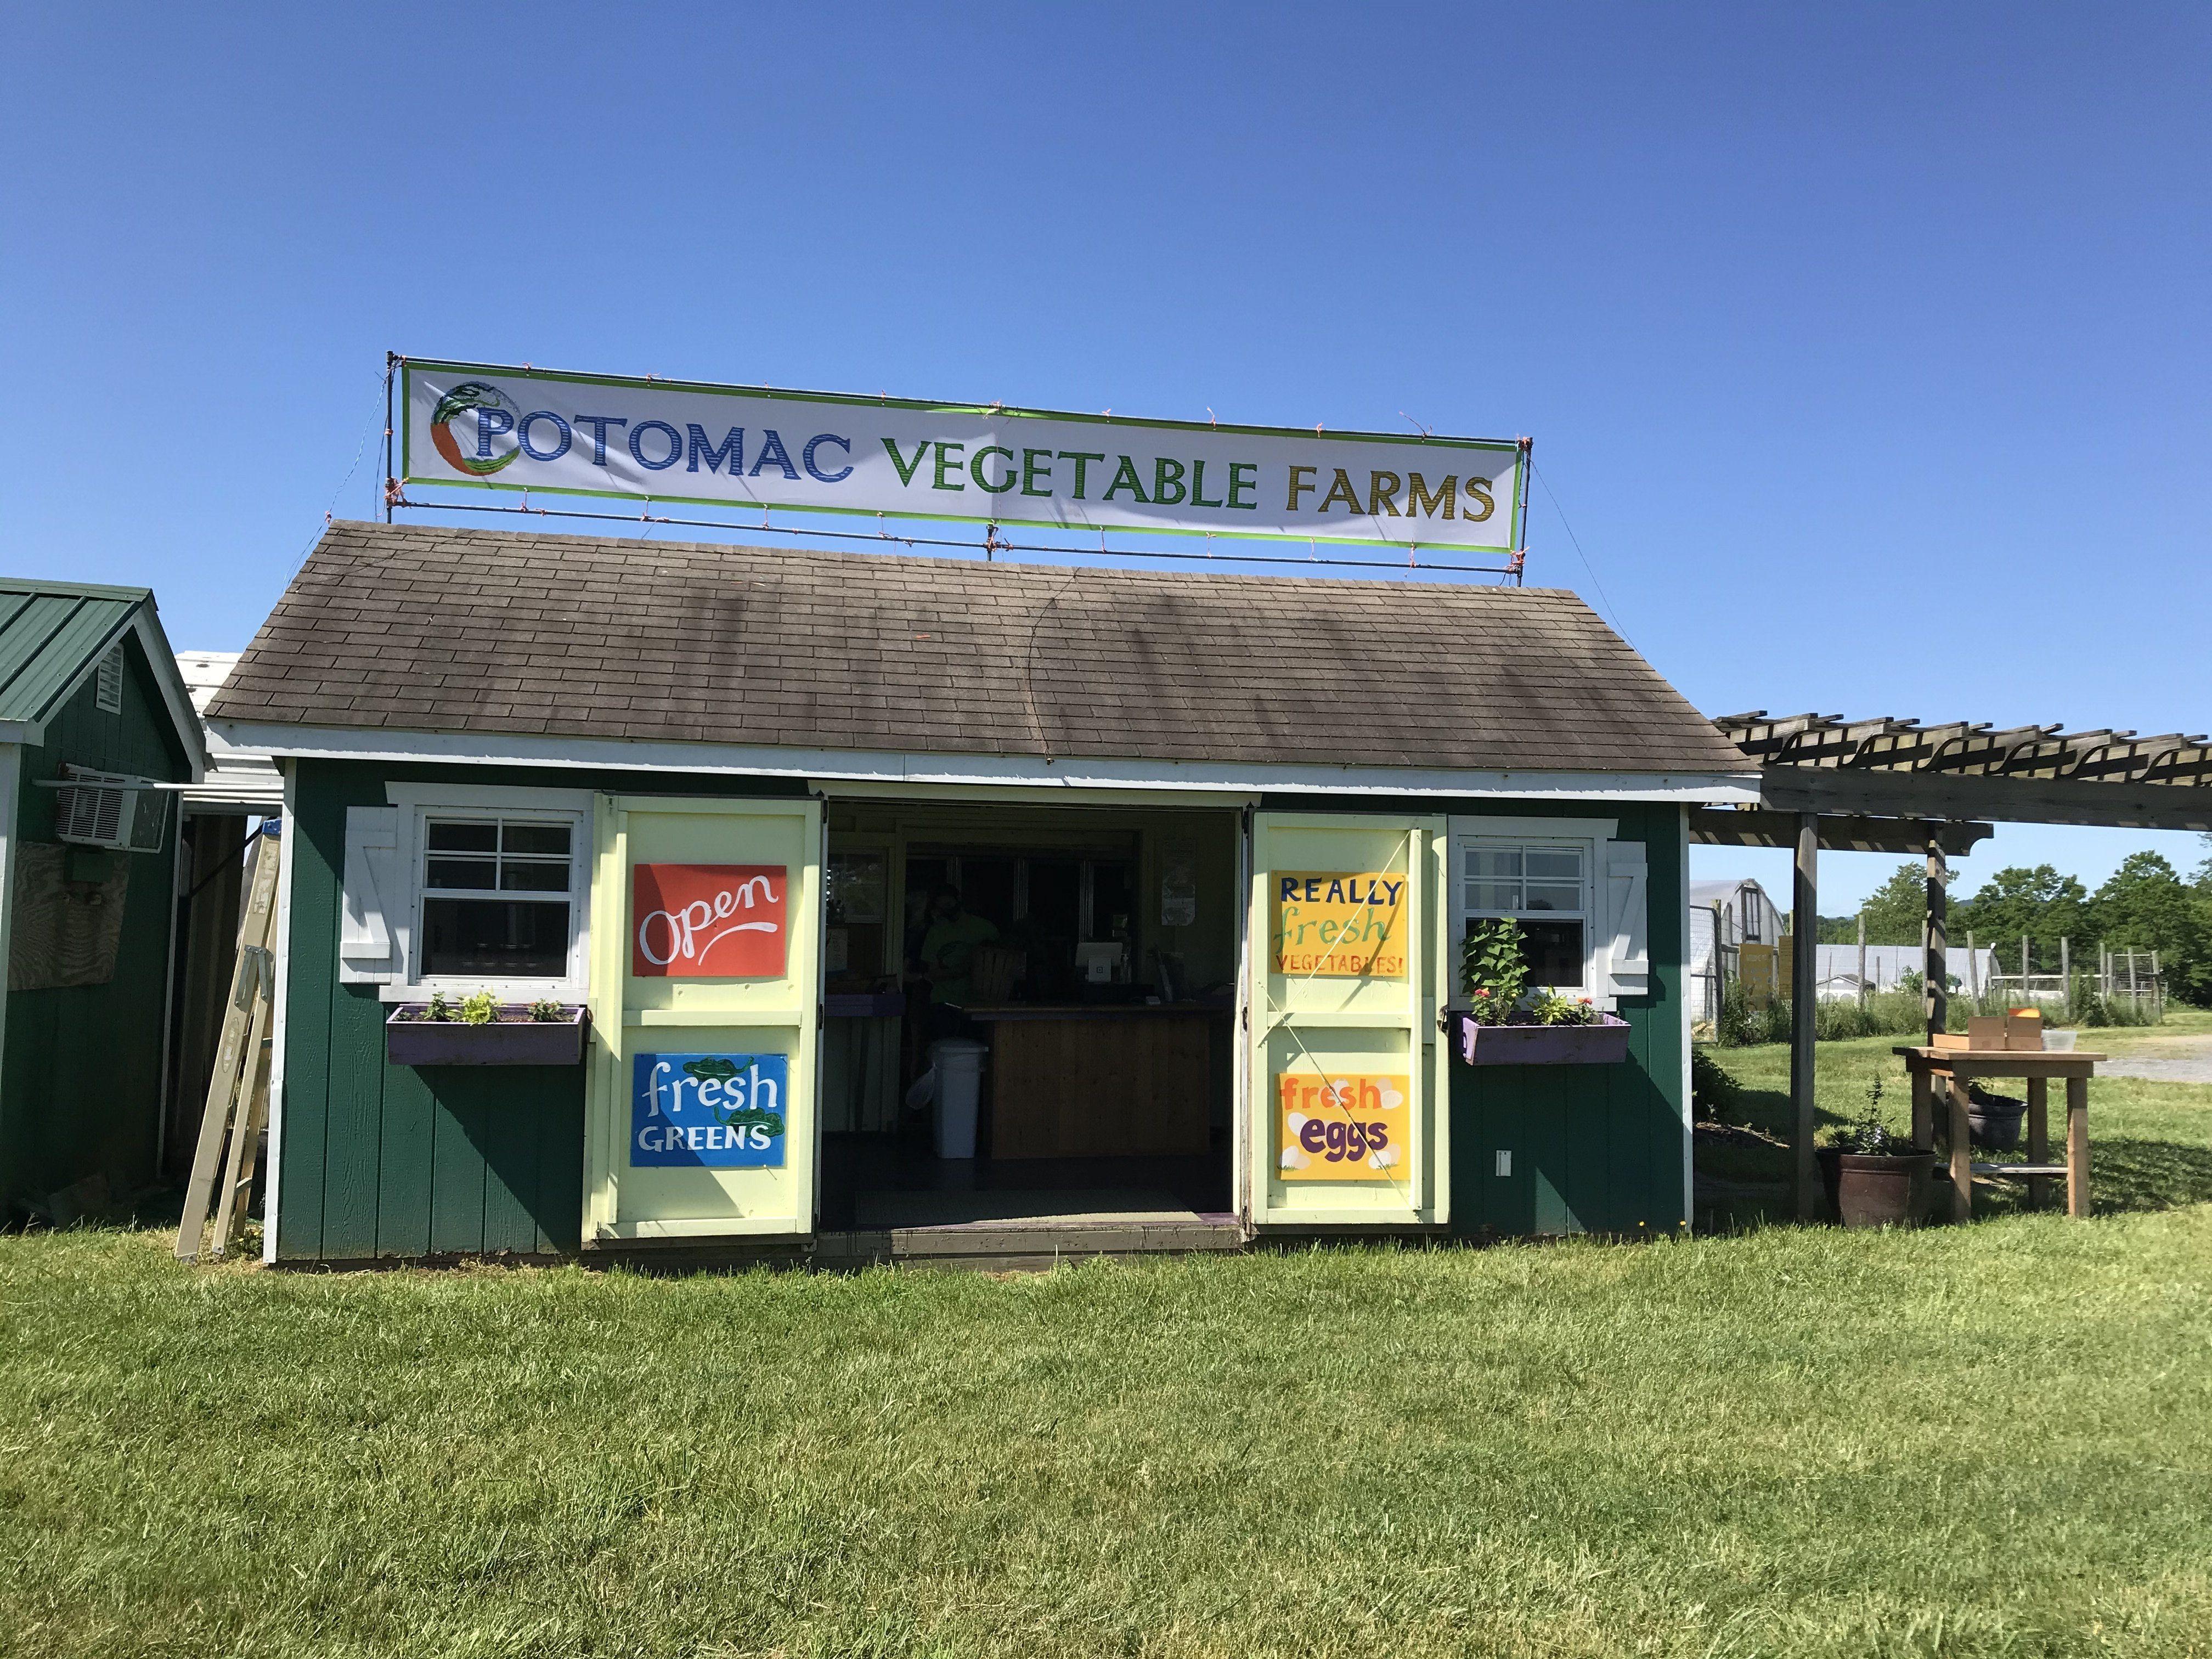 Next Happening: Farm Happenings for June 6, 2020